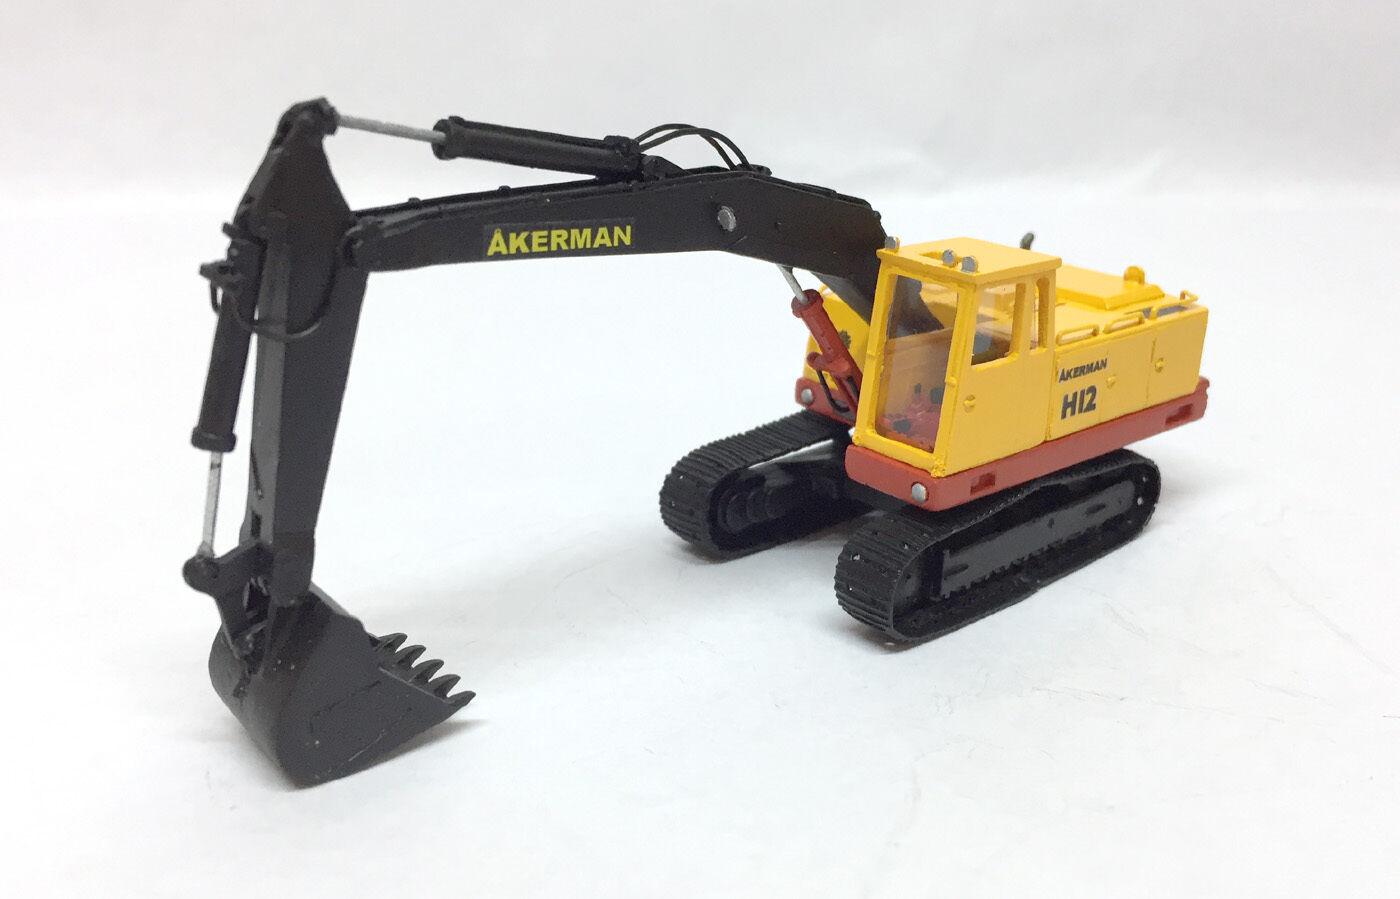 Ho 1/87 Excavadora Akerman H12-ready made Resina Modelo por Fankit Models